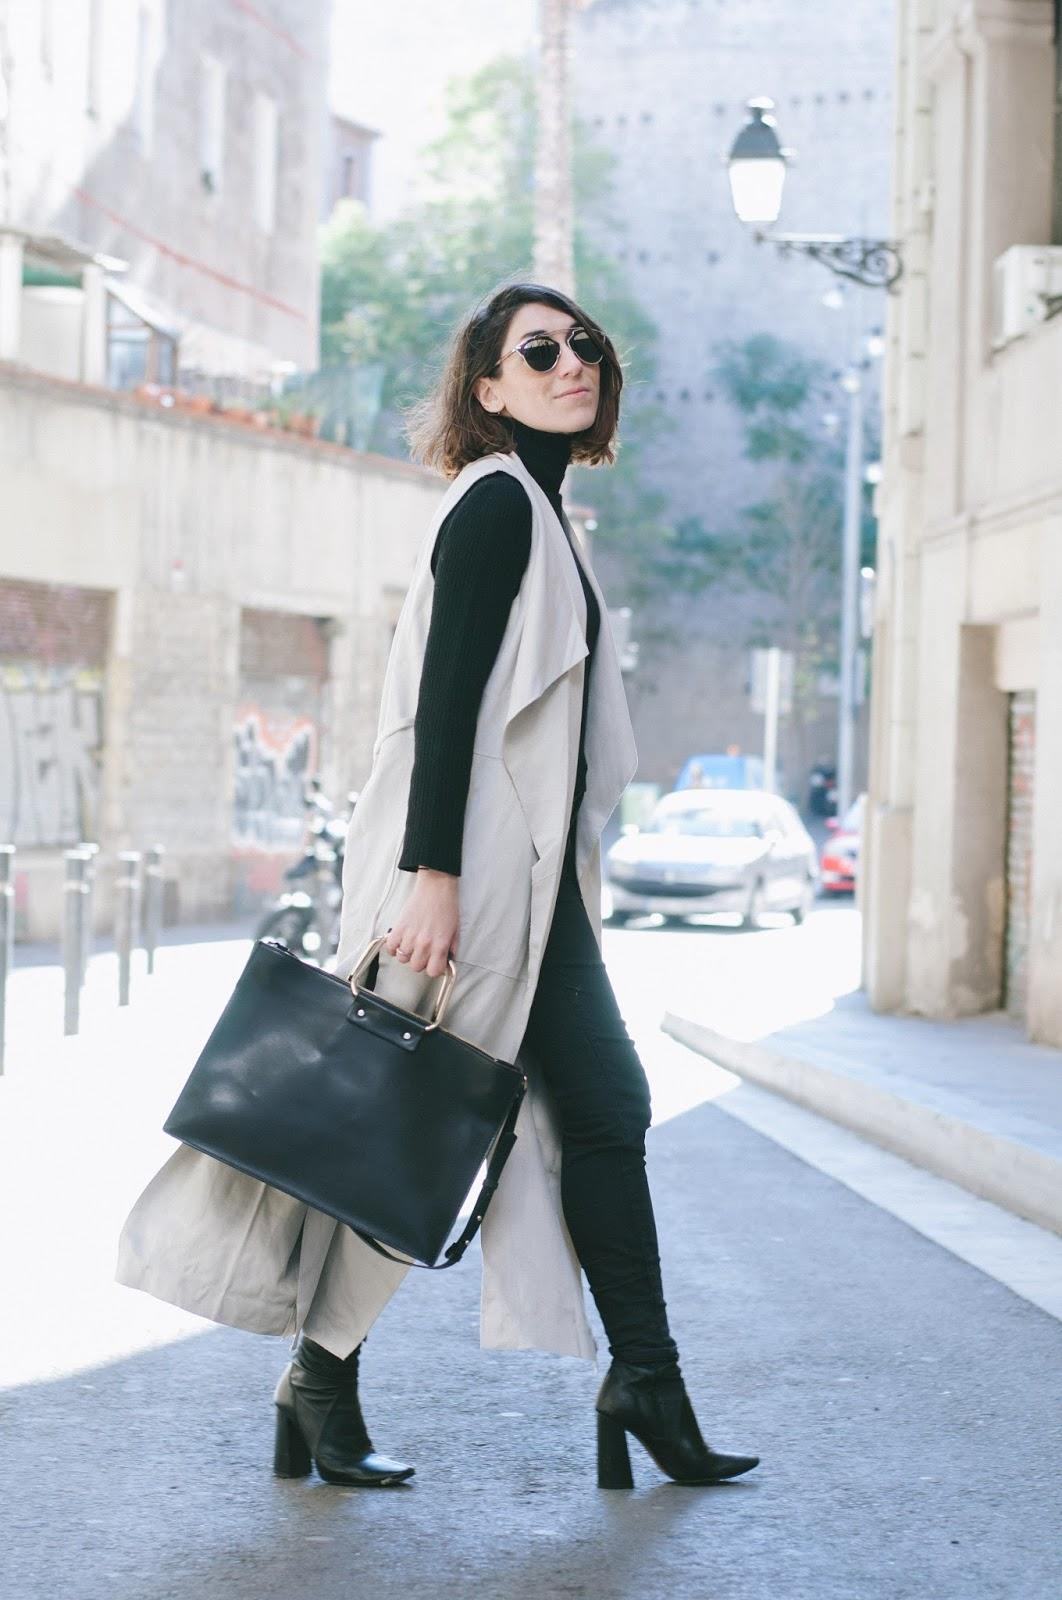 Chaleco Mango, Jersey , botines, tejanos, cartera Zara